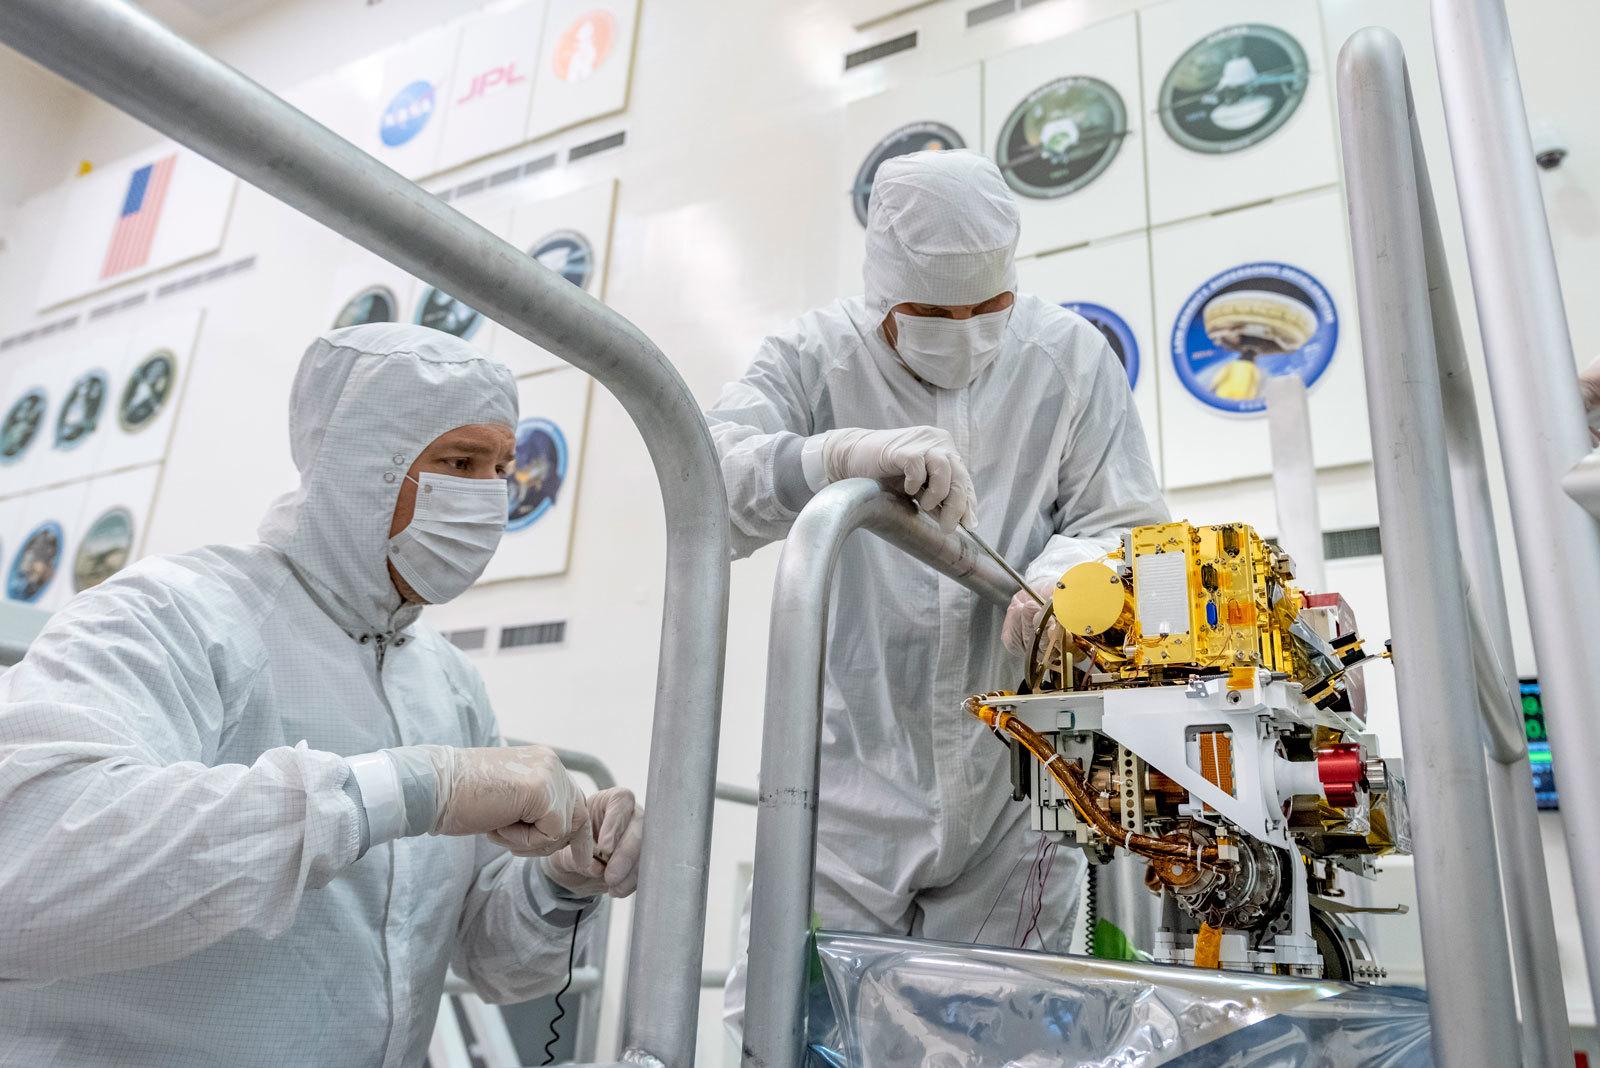 Read article: Mars 2020 Rover Gets a Super Instrument